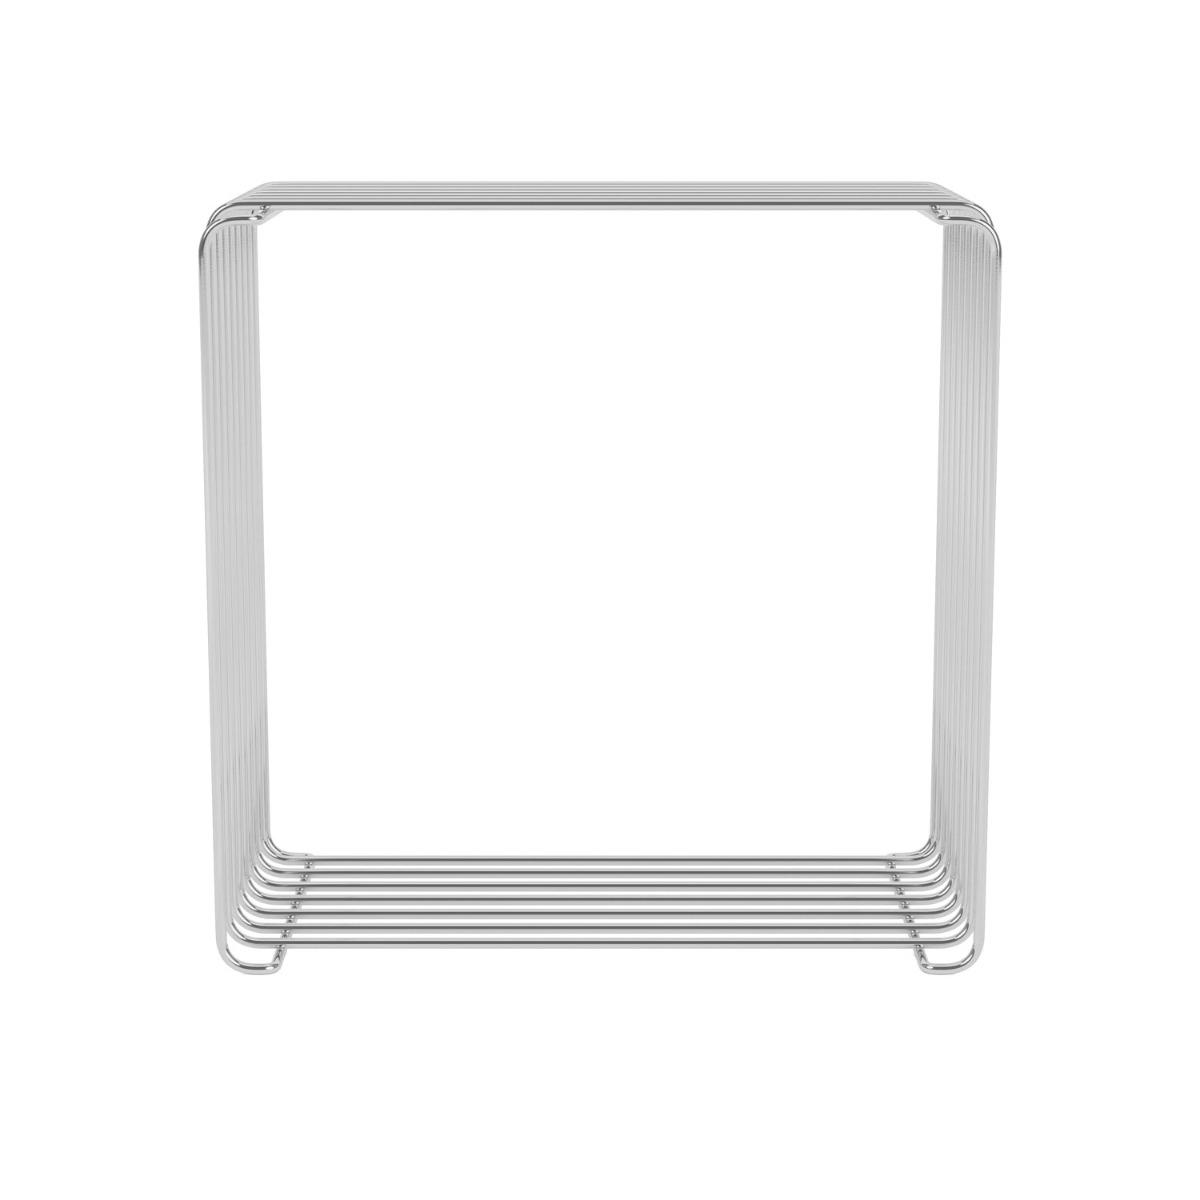 Montana Förvaringsmodul Wire 34,8x18,8cm Chrome